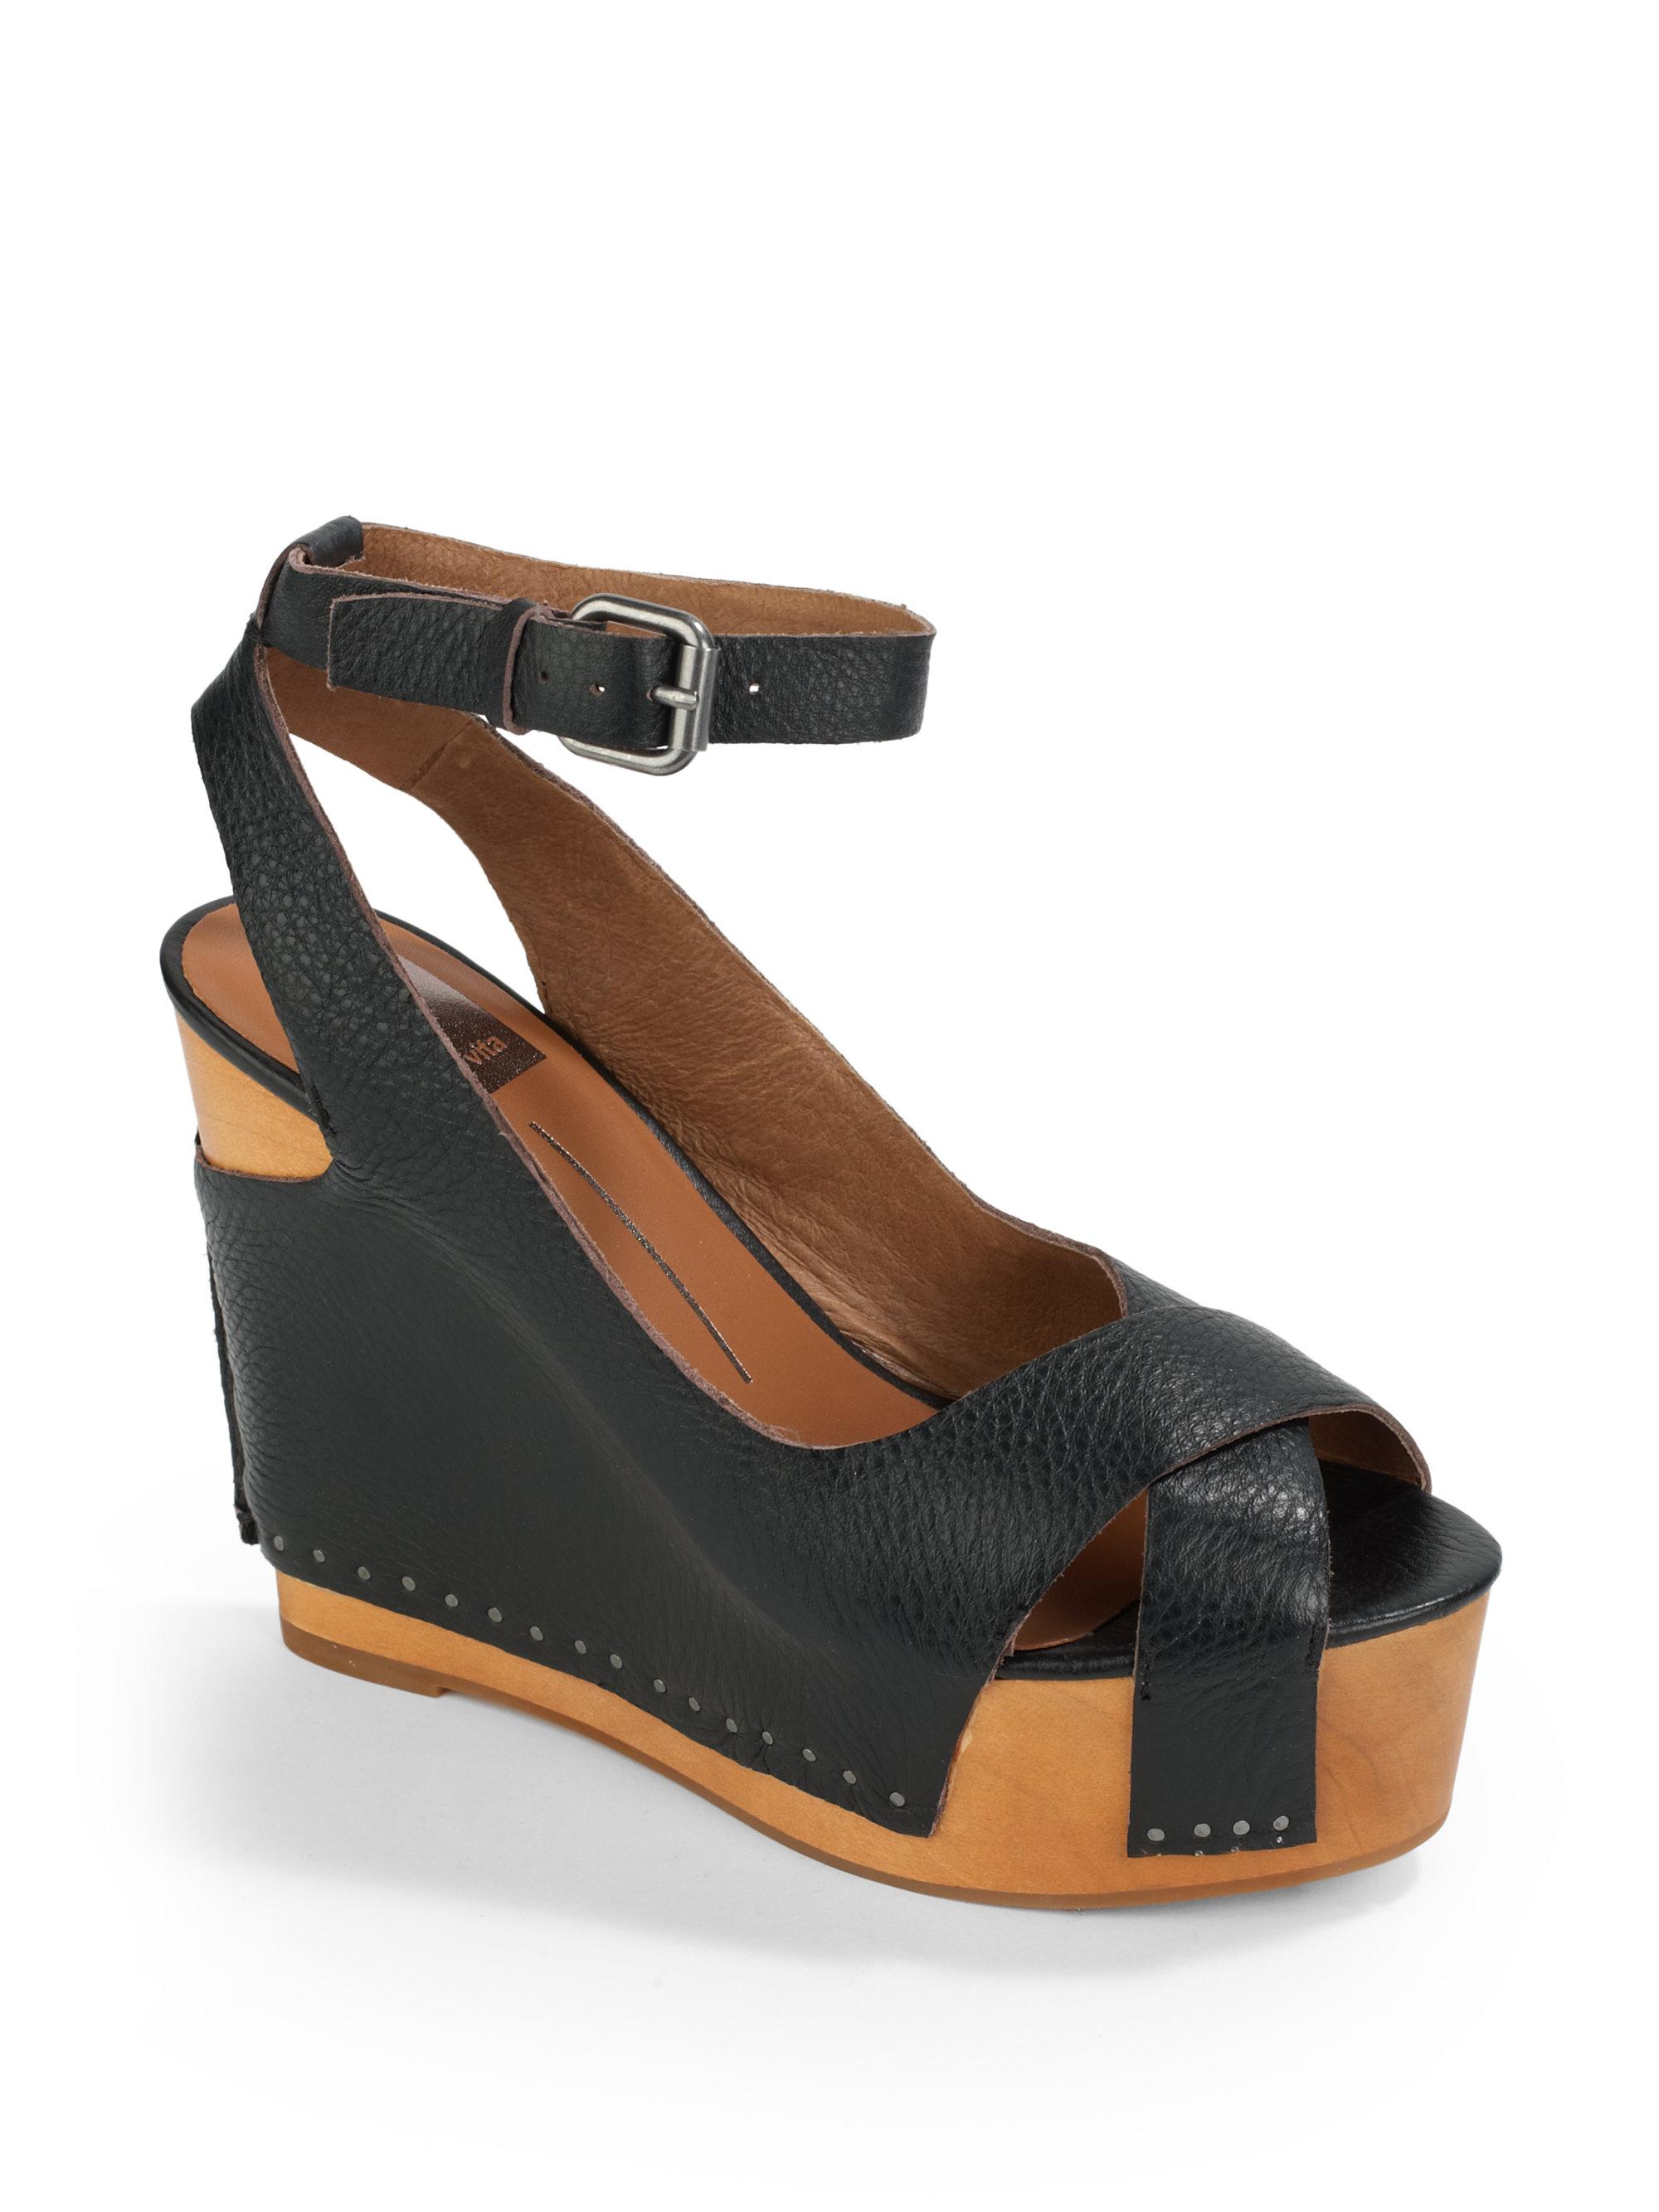 dolce vita jaelyn wooden wedge sandals in black lyst